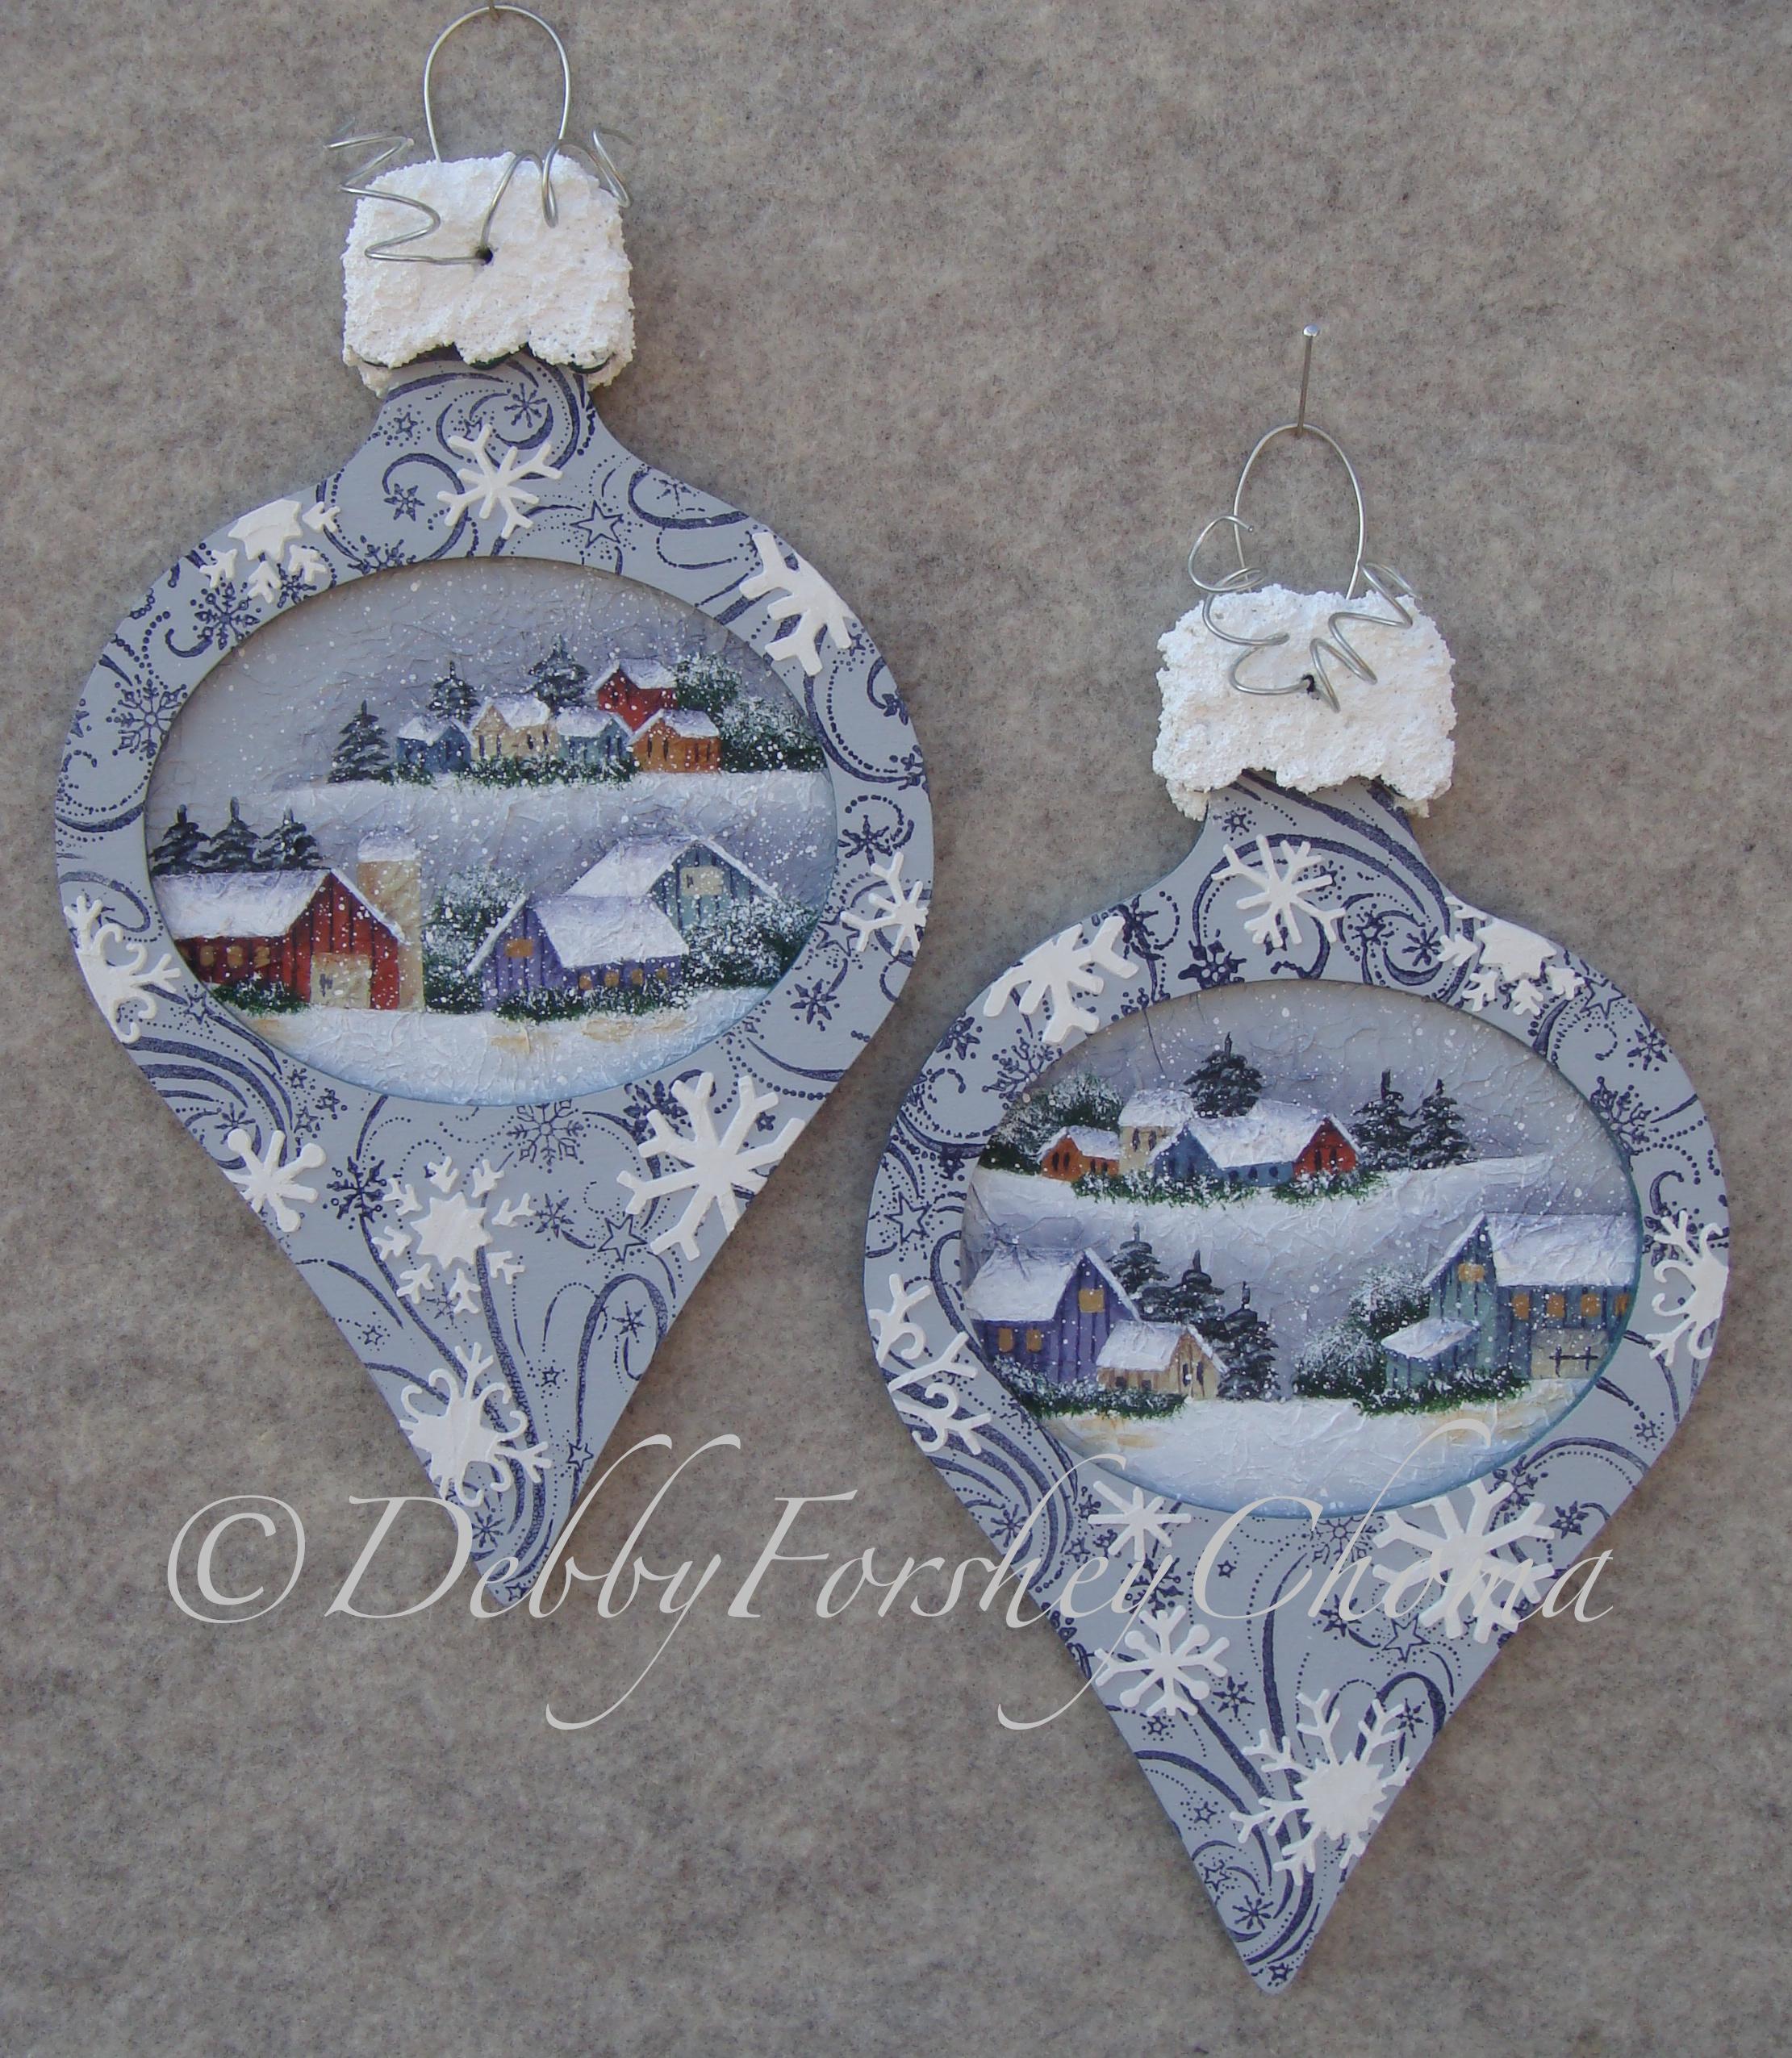 Snowflake Village - E-Packet - Debby Forshey-Choma